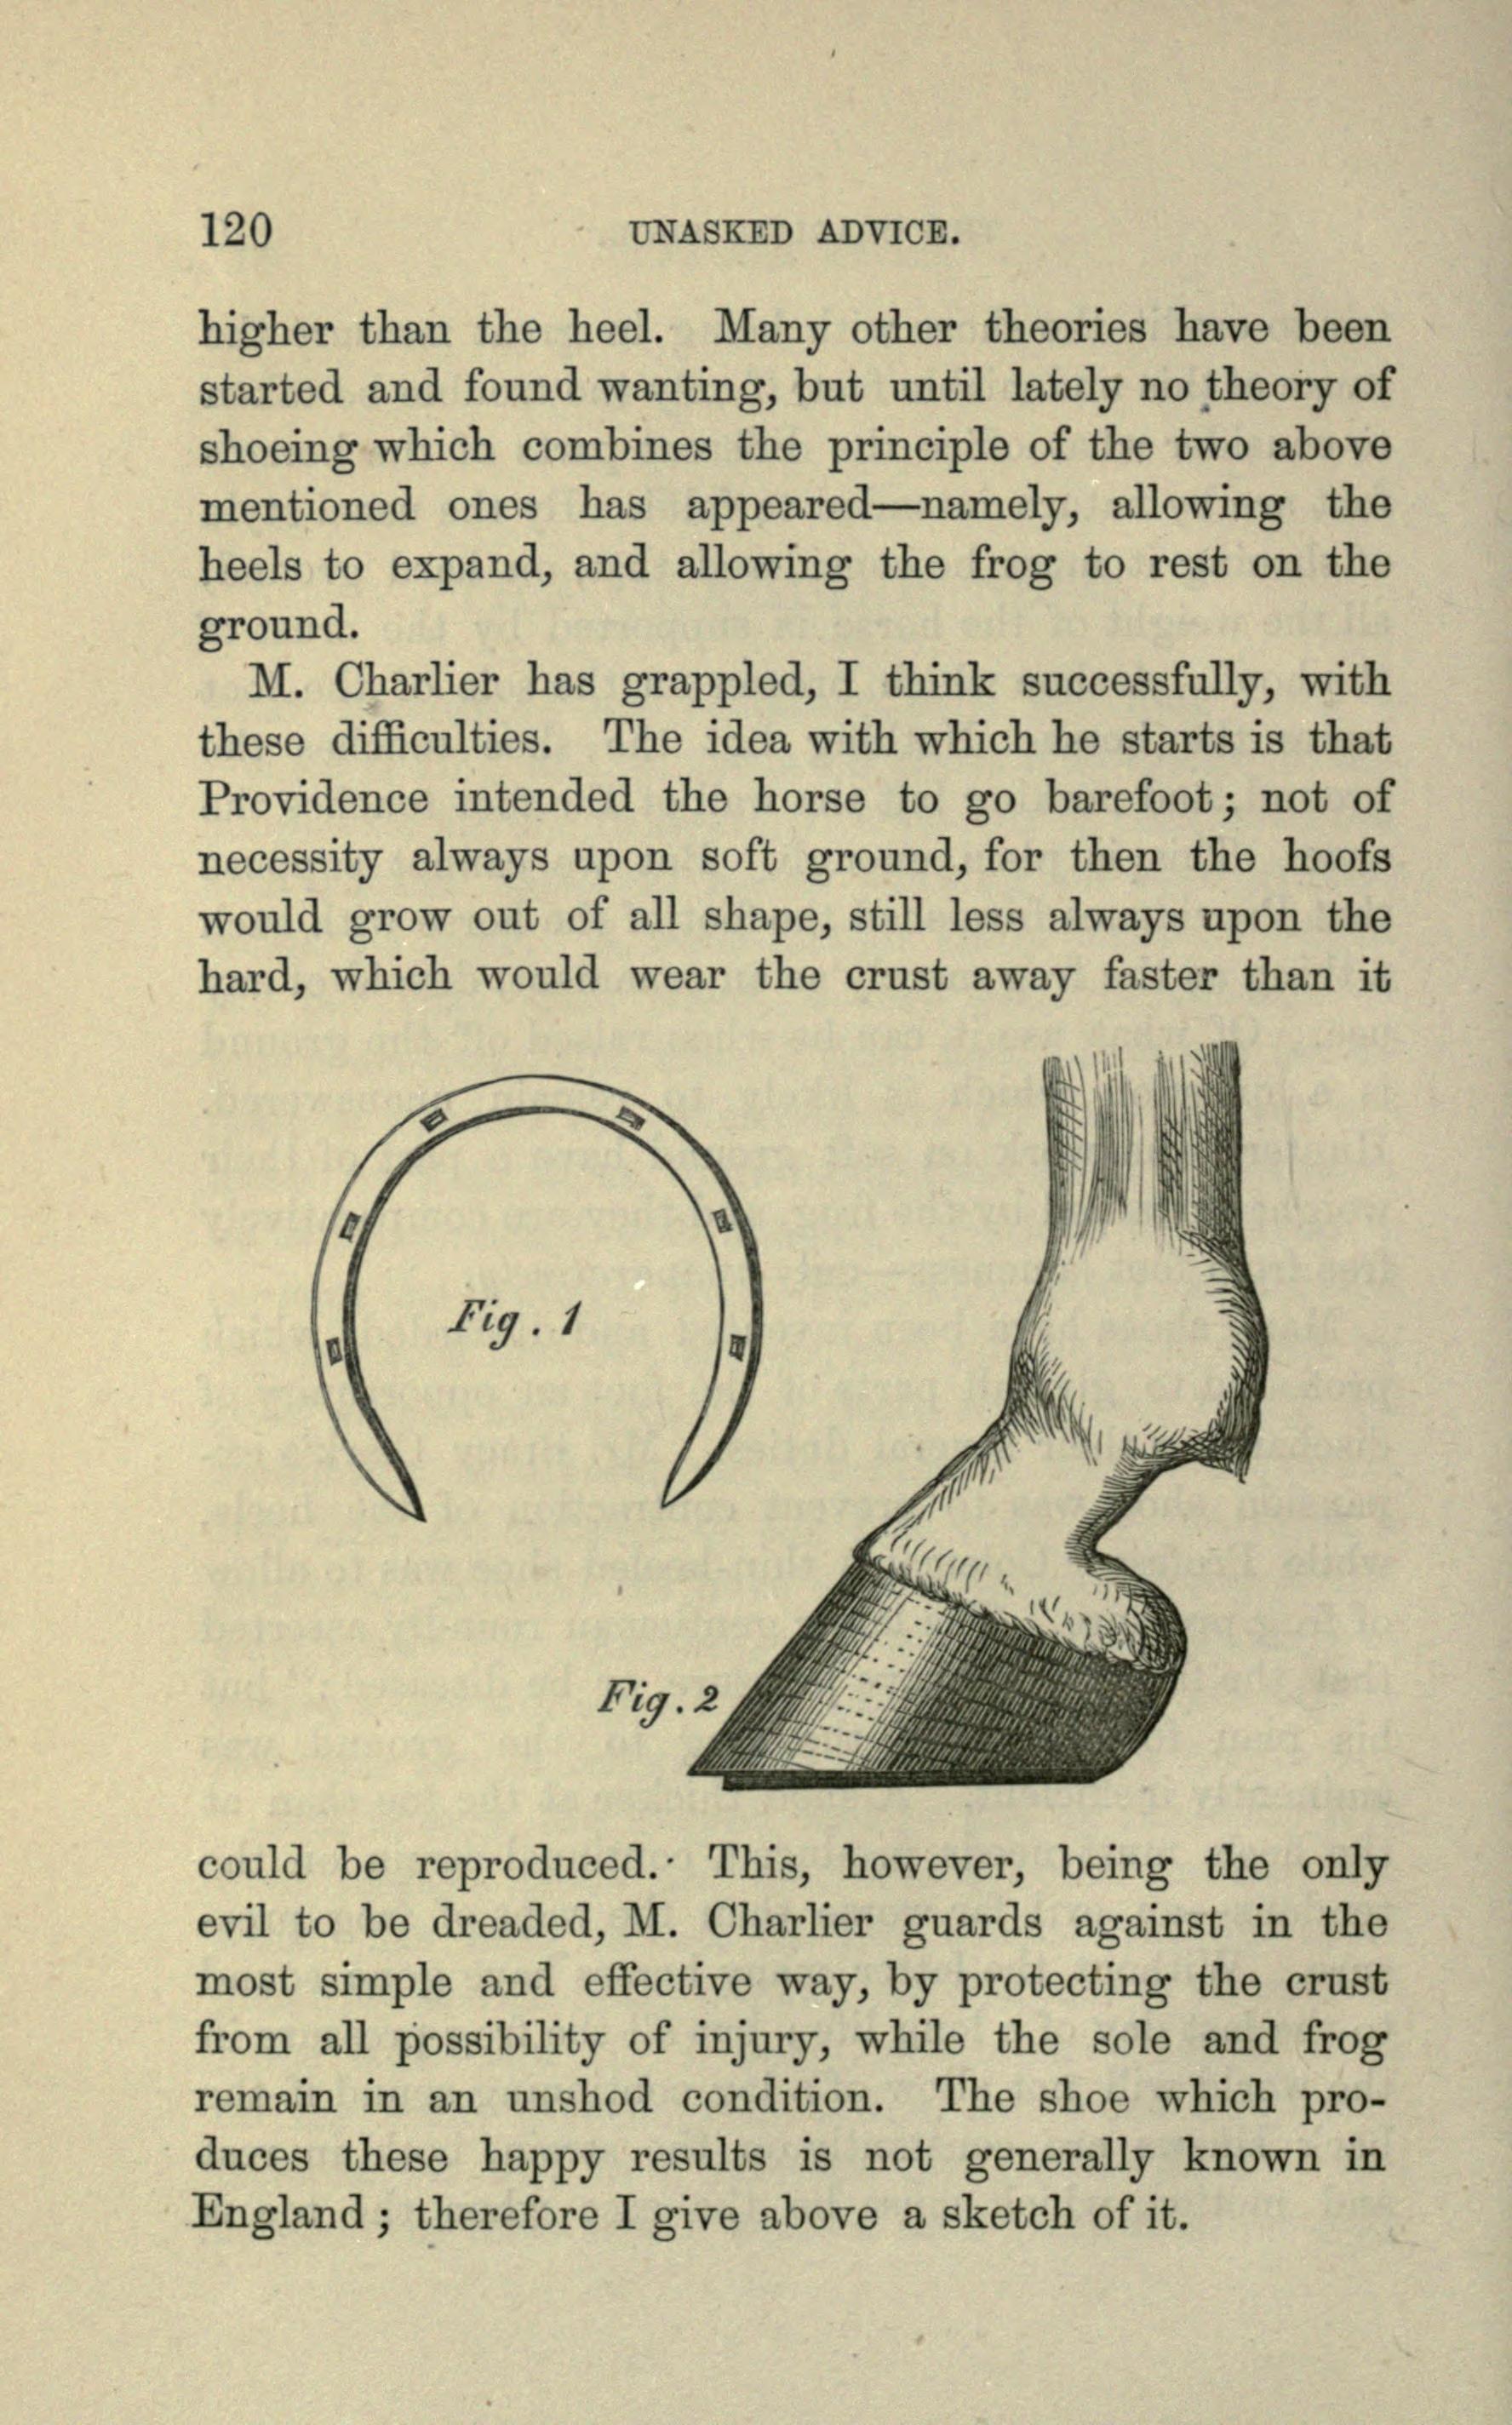 File:Unasked advice (Page 120) BHL20691413.jpg - Wikimedia Commons